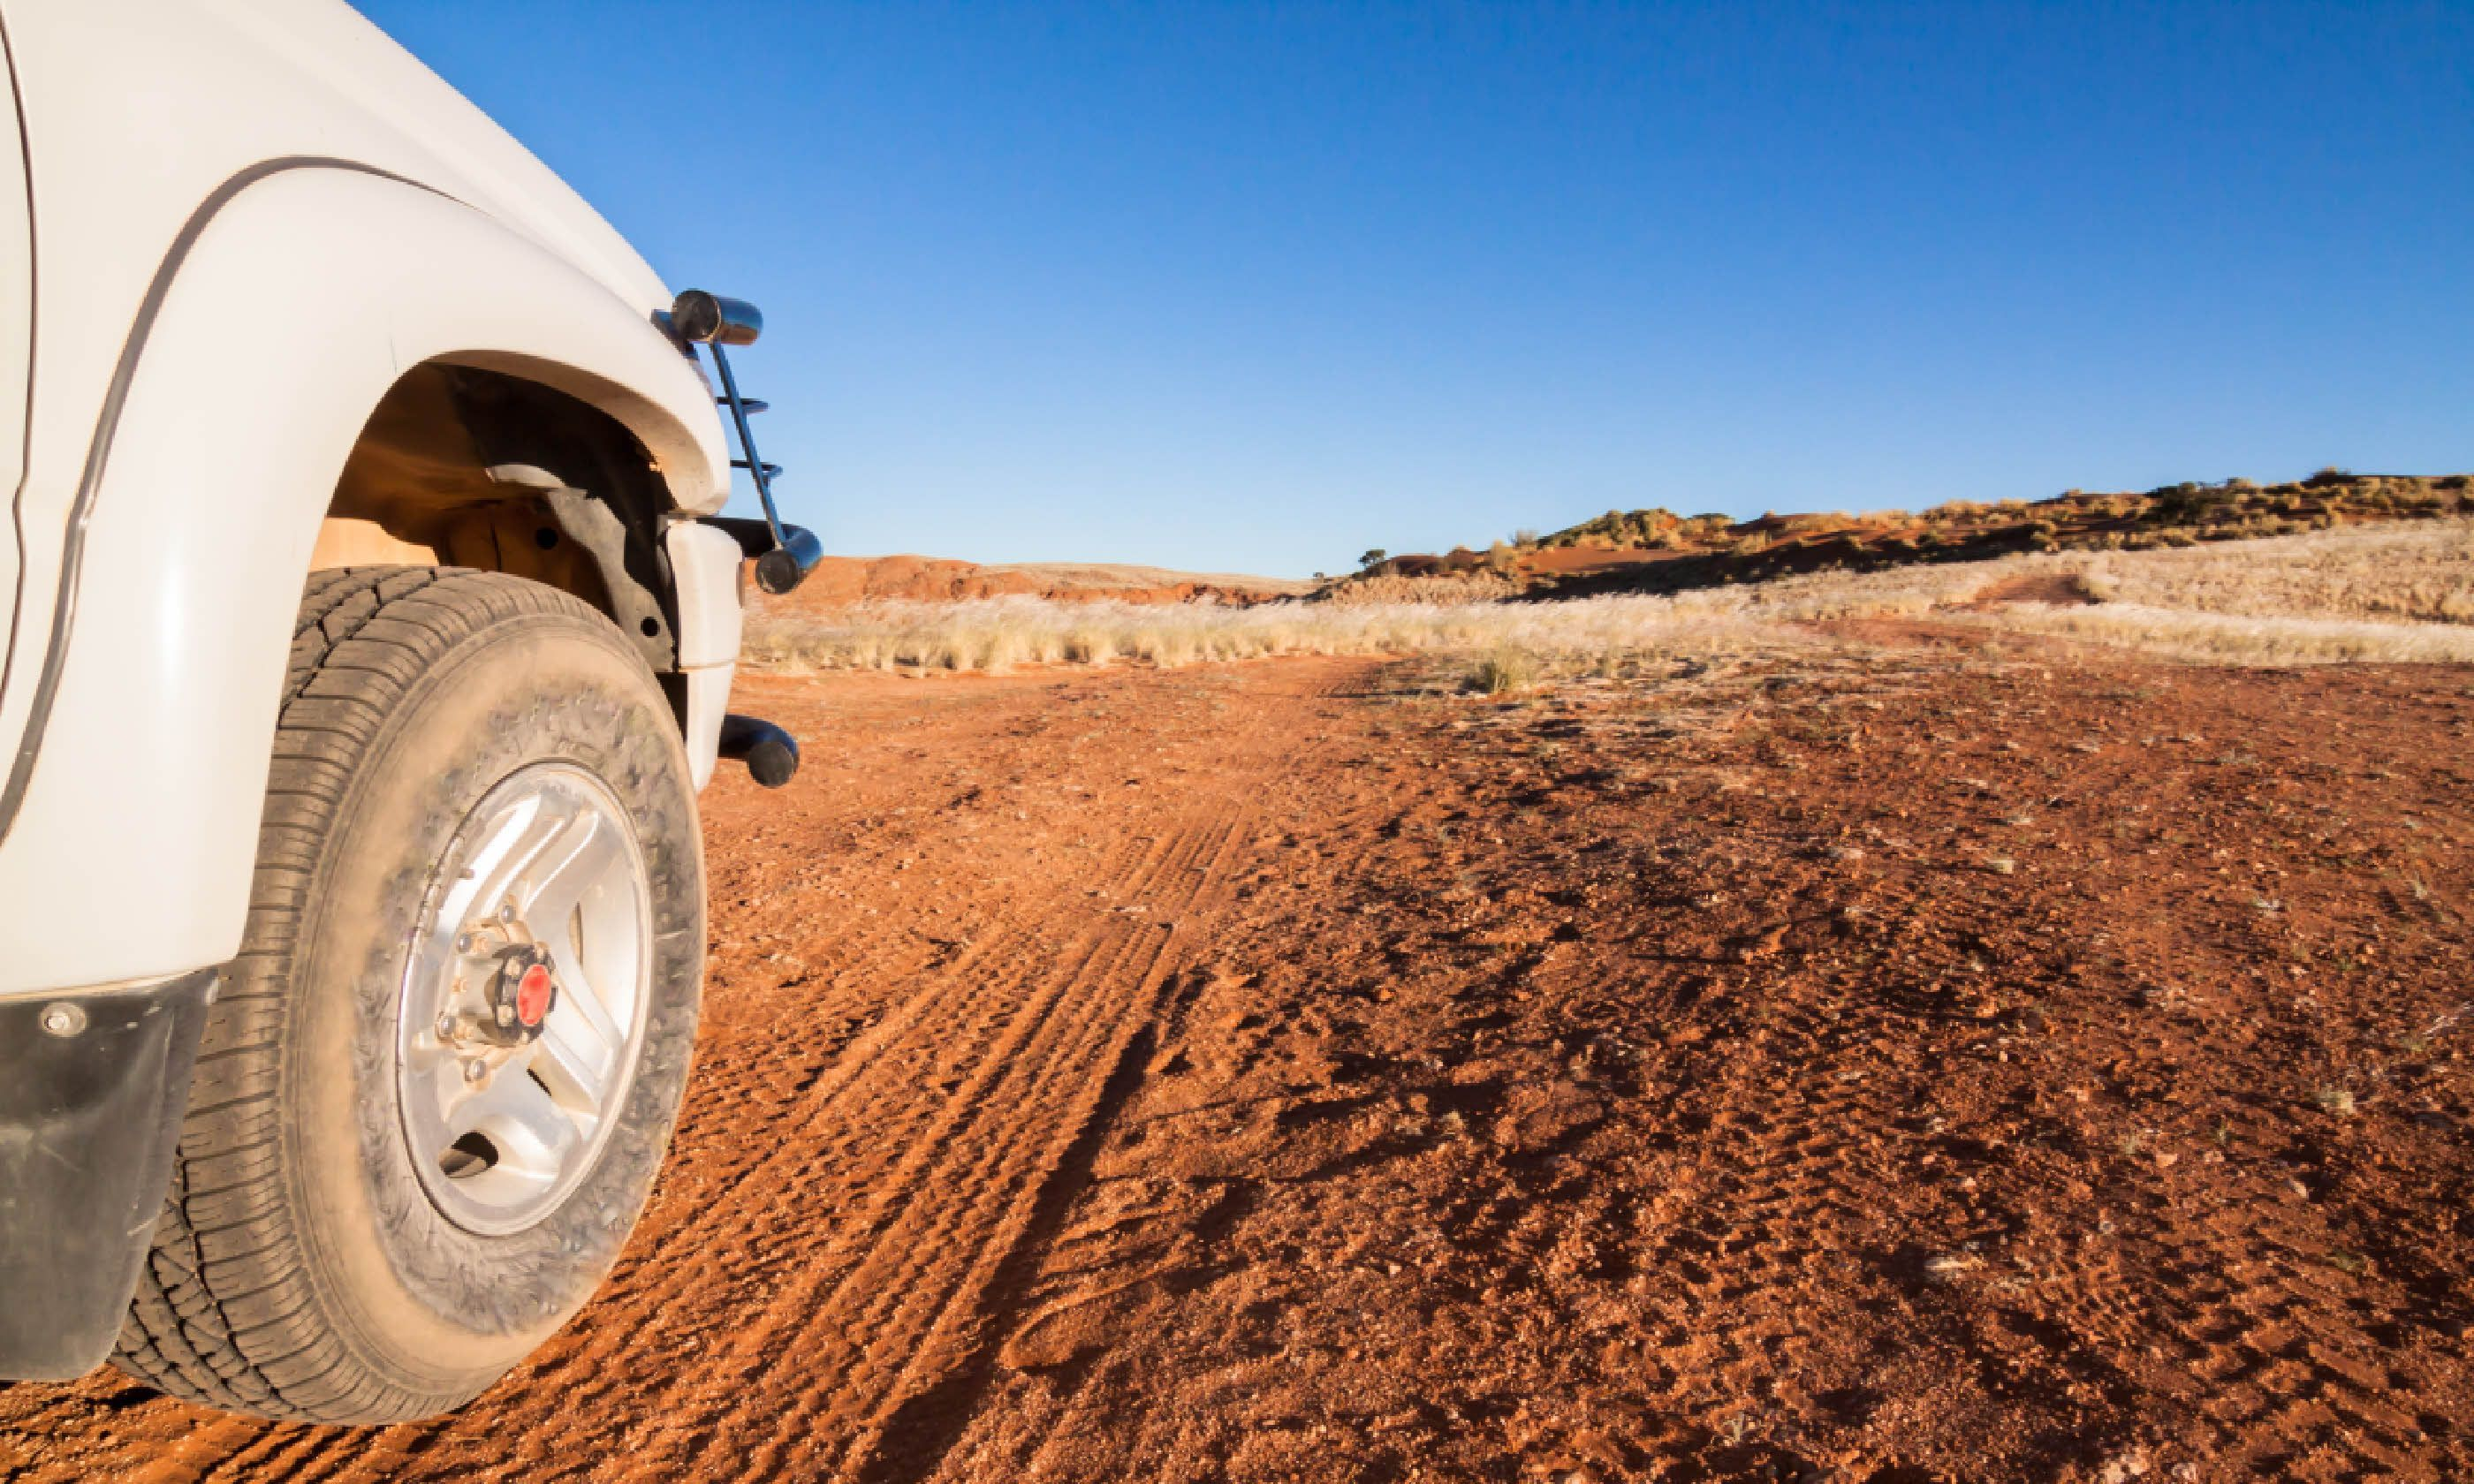 Car on sandy trail in Kalahari desert (Shutterstock)